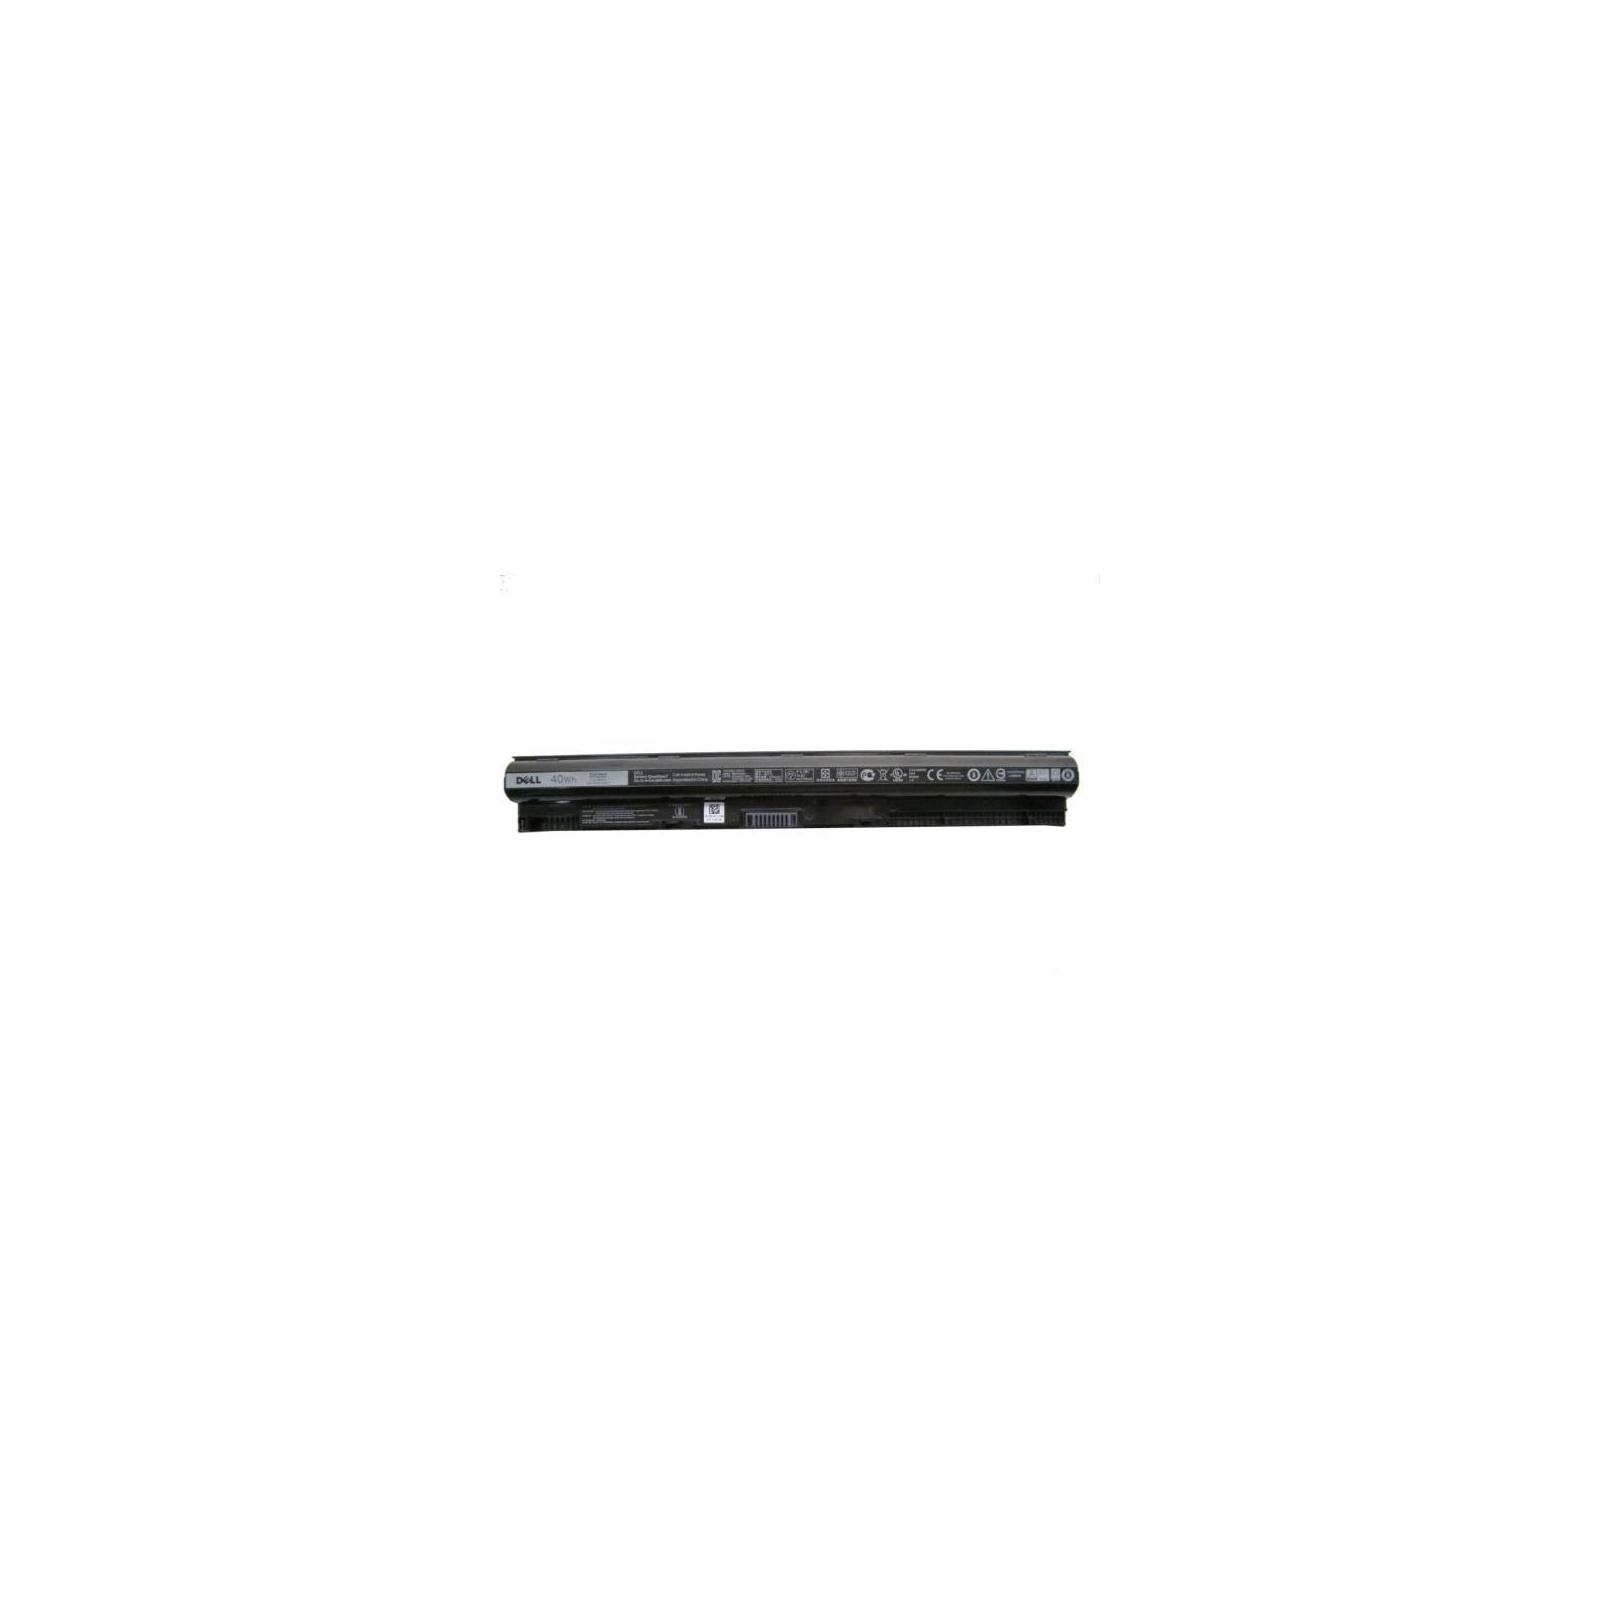 Аккумулятор для ноутбука Dell Inspiron 15R-3451 K185W, 47Wh (3190mAh), 4cell, 14.8V, Li-io (A47208)